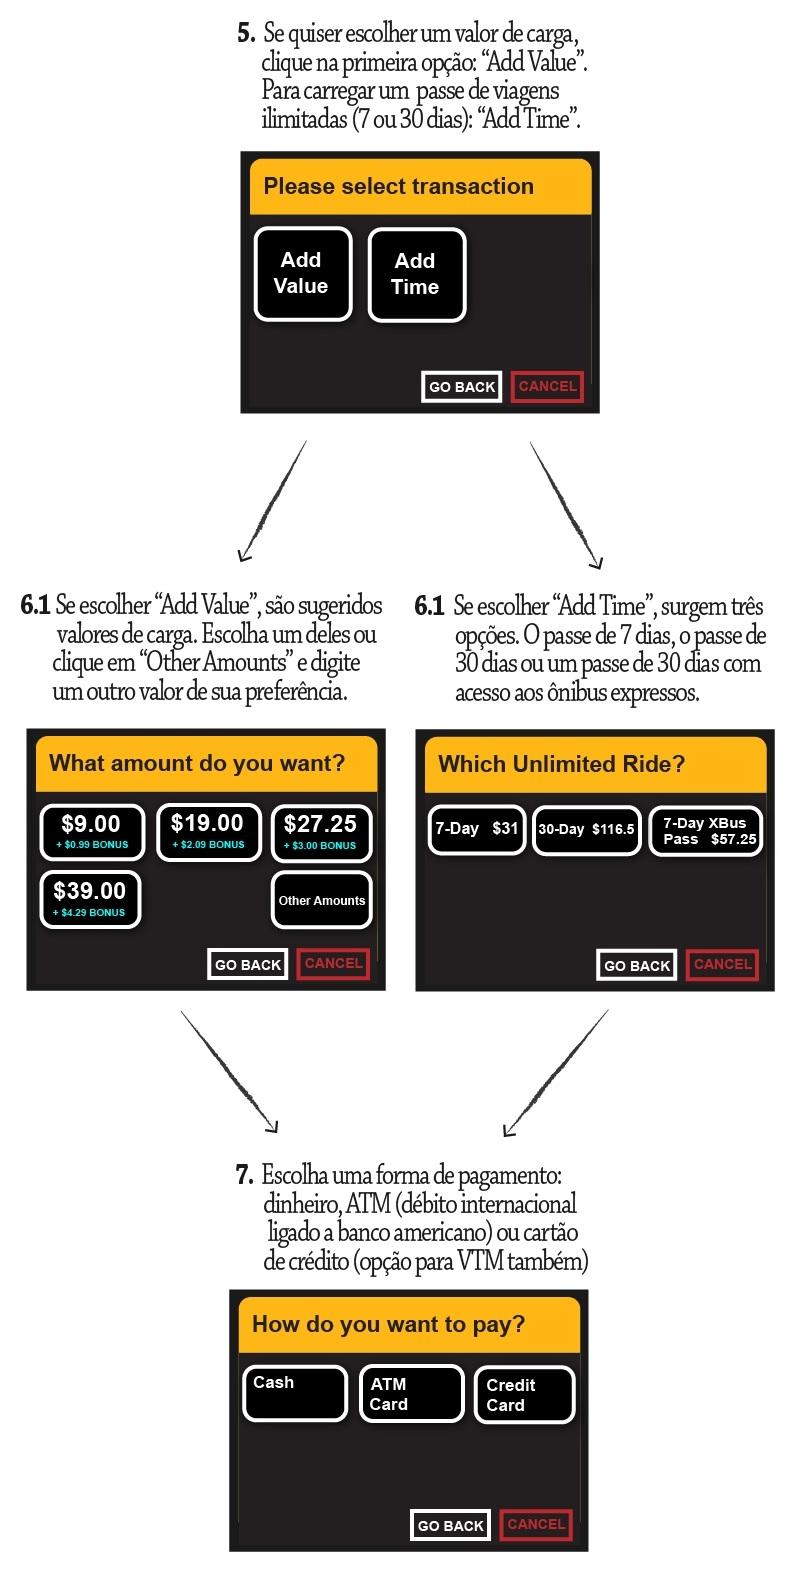 Onde comprar metrocard maquina passo a passo 12